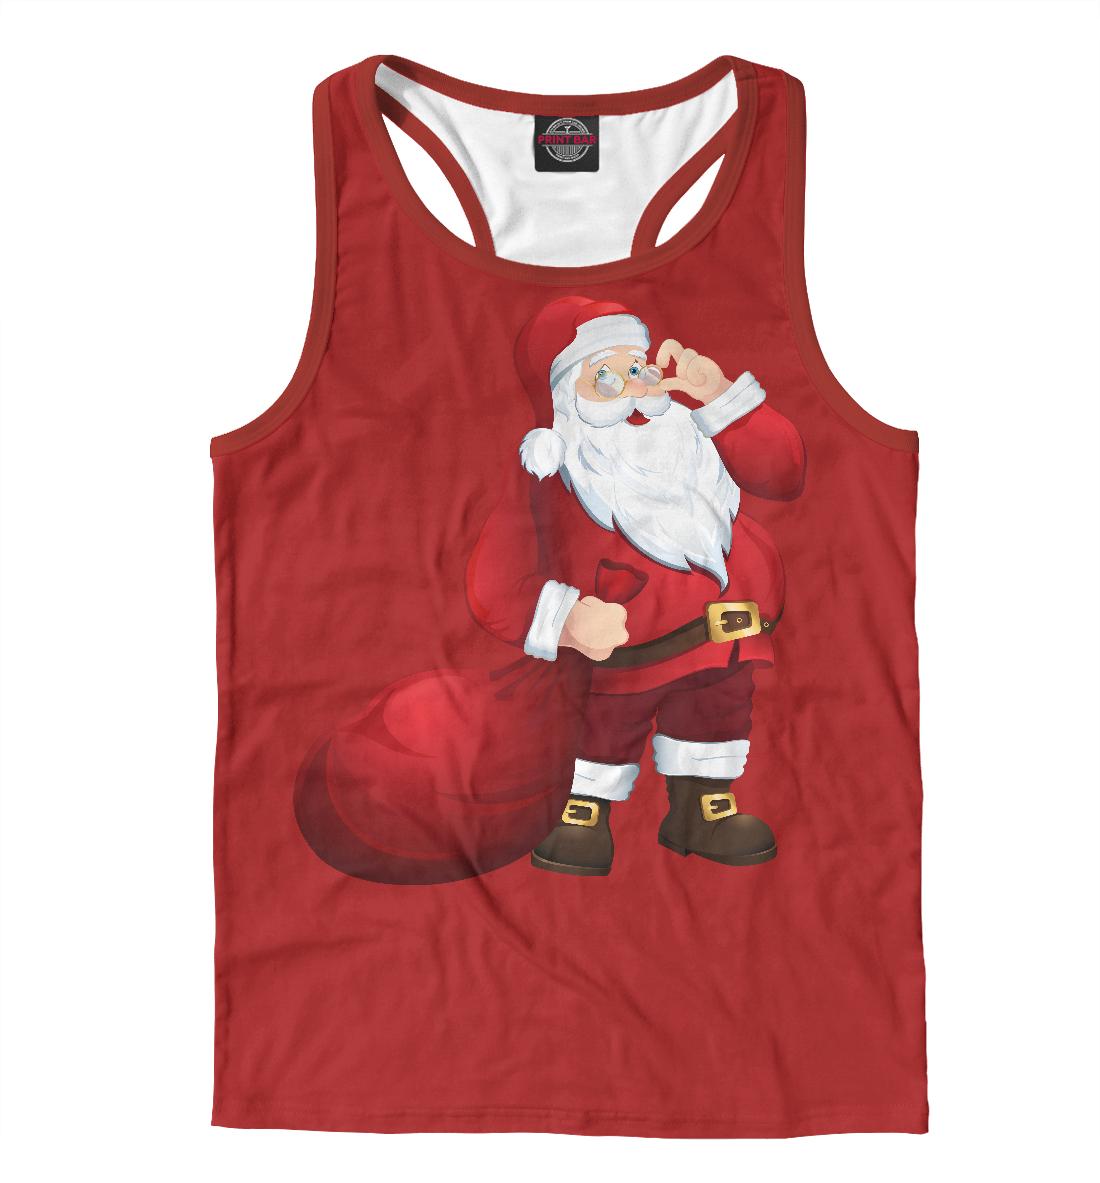 Купить Дед Мороз, Printbar, Майки борцовки, NOV-285651-mayb-2